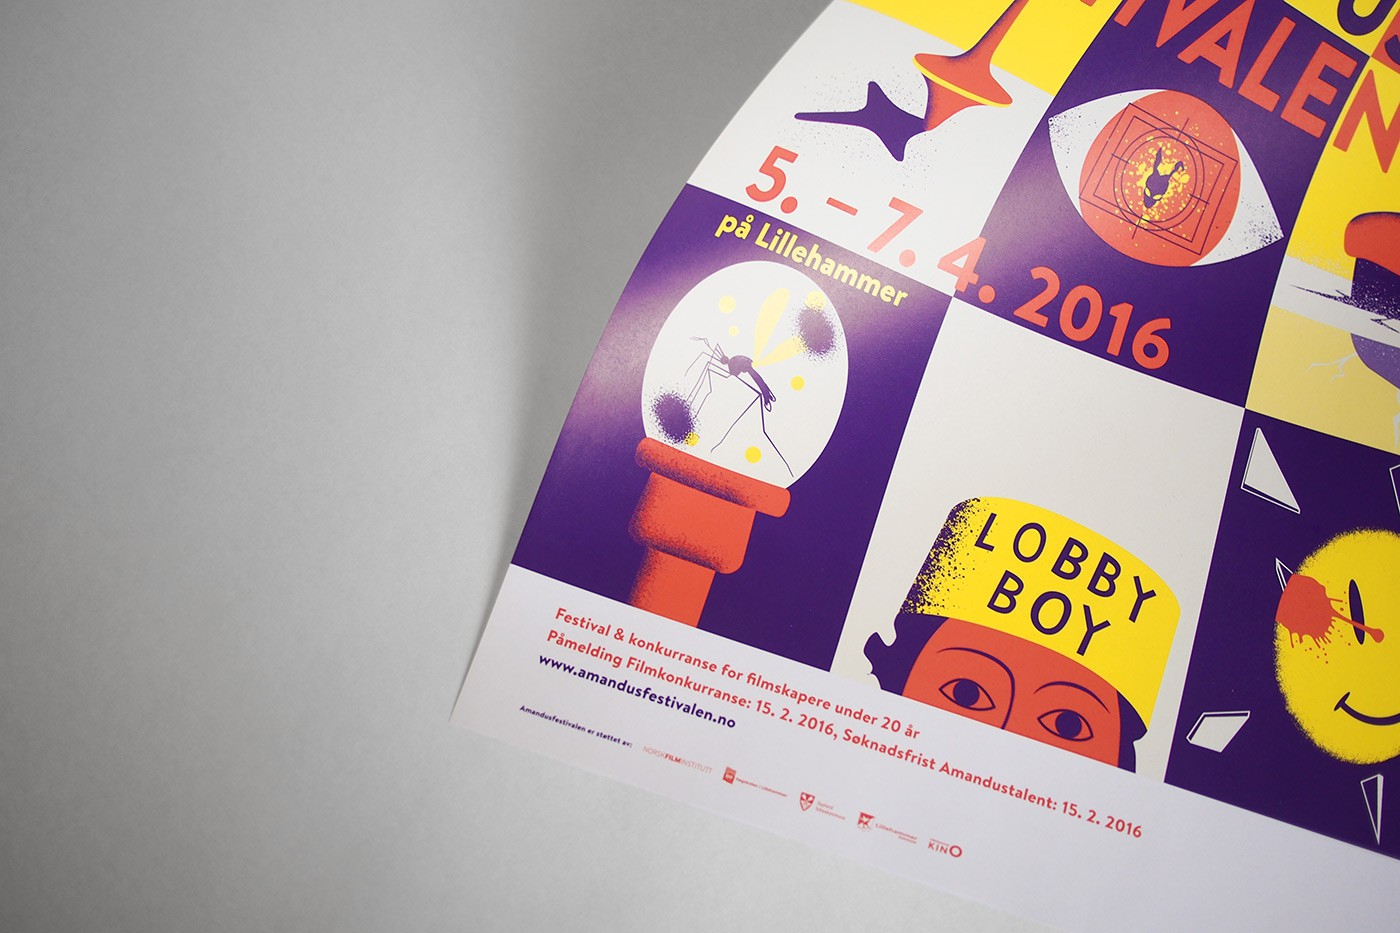 amandus 2016 poster design by upstruct